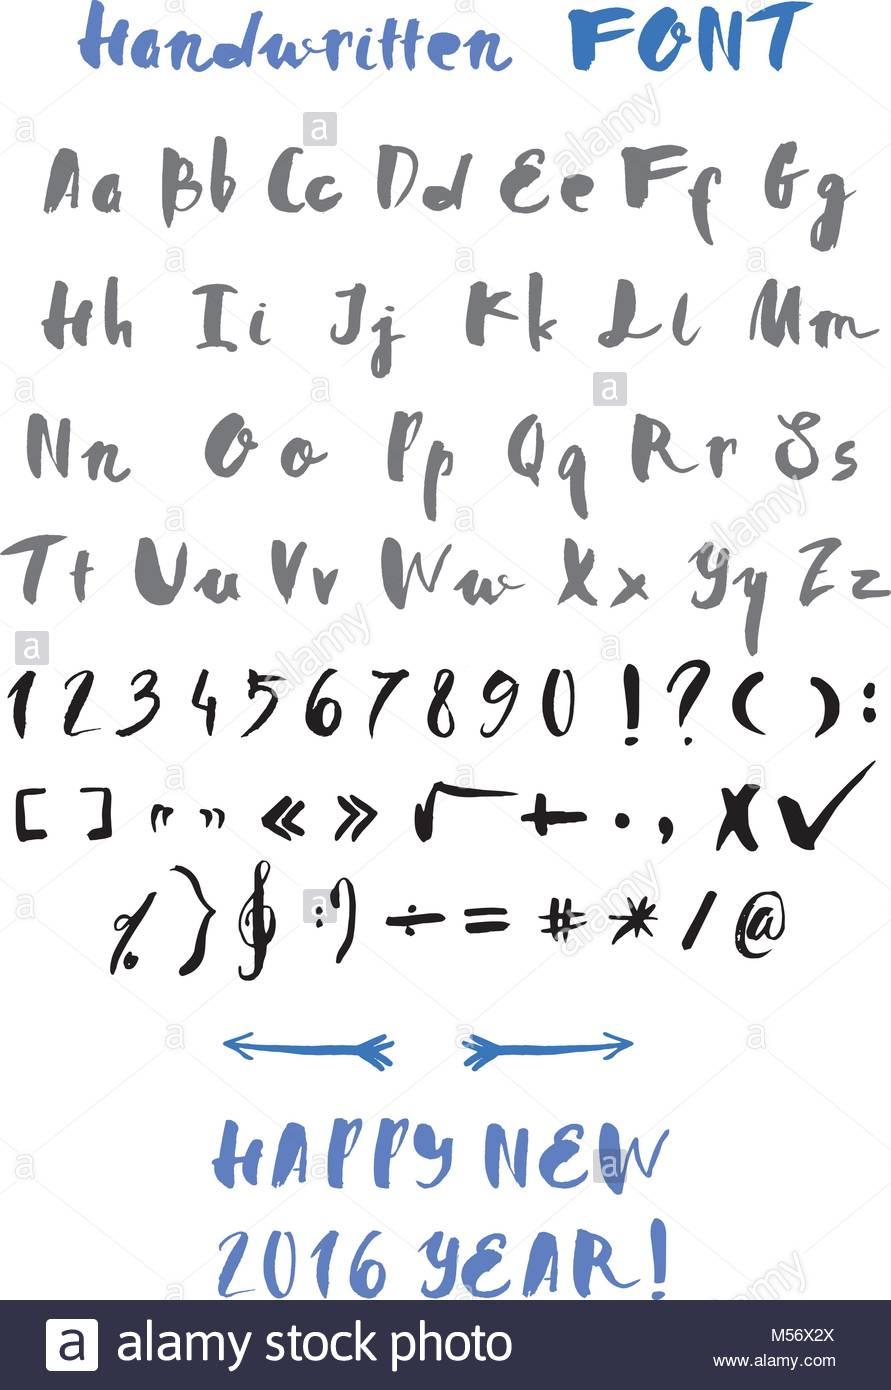 Handwritten Alphabet Stock Vector Image & Art - Alamy